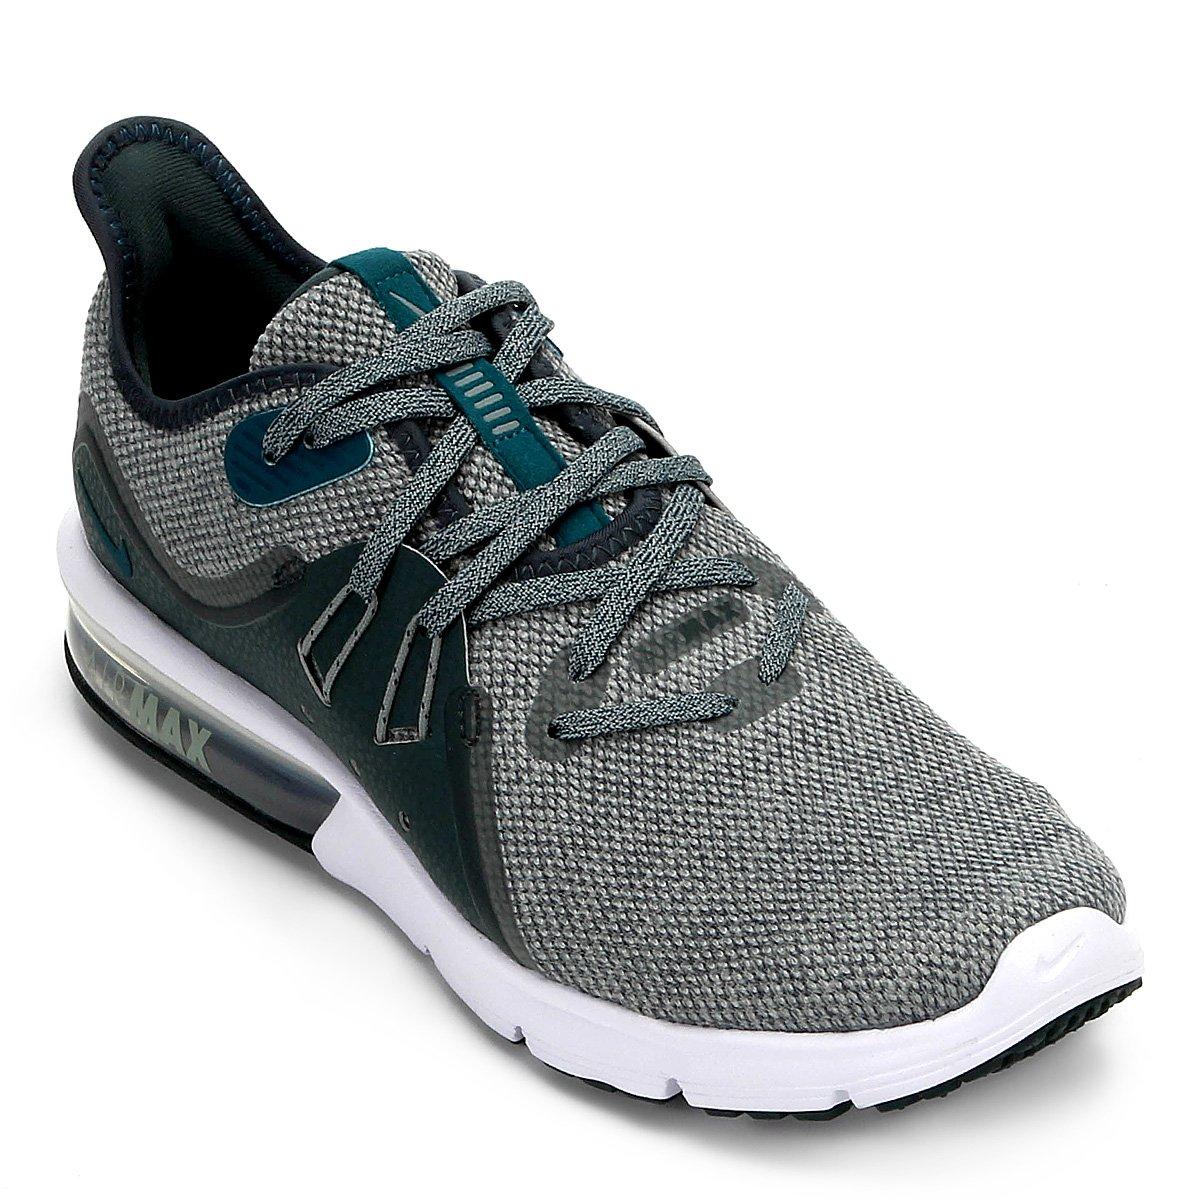 promo code b8d5e 5154e Tênis Nike Air Max Sequent 3 Masculino - Verde e Cinza - Compre Agora   Netshoes